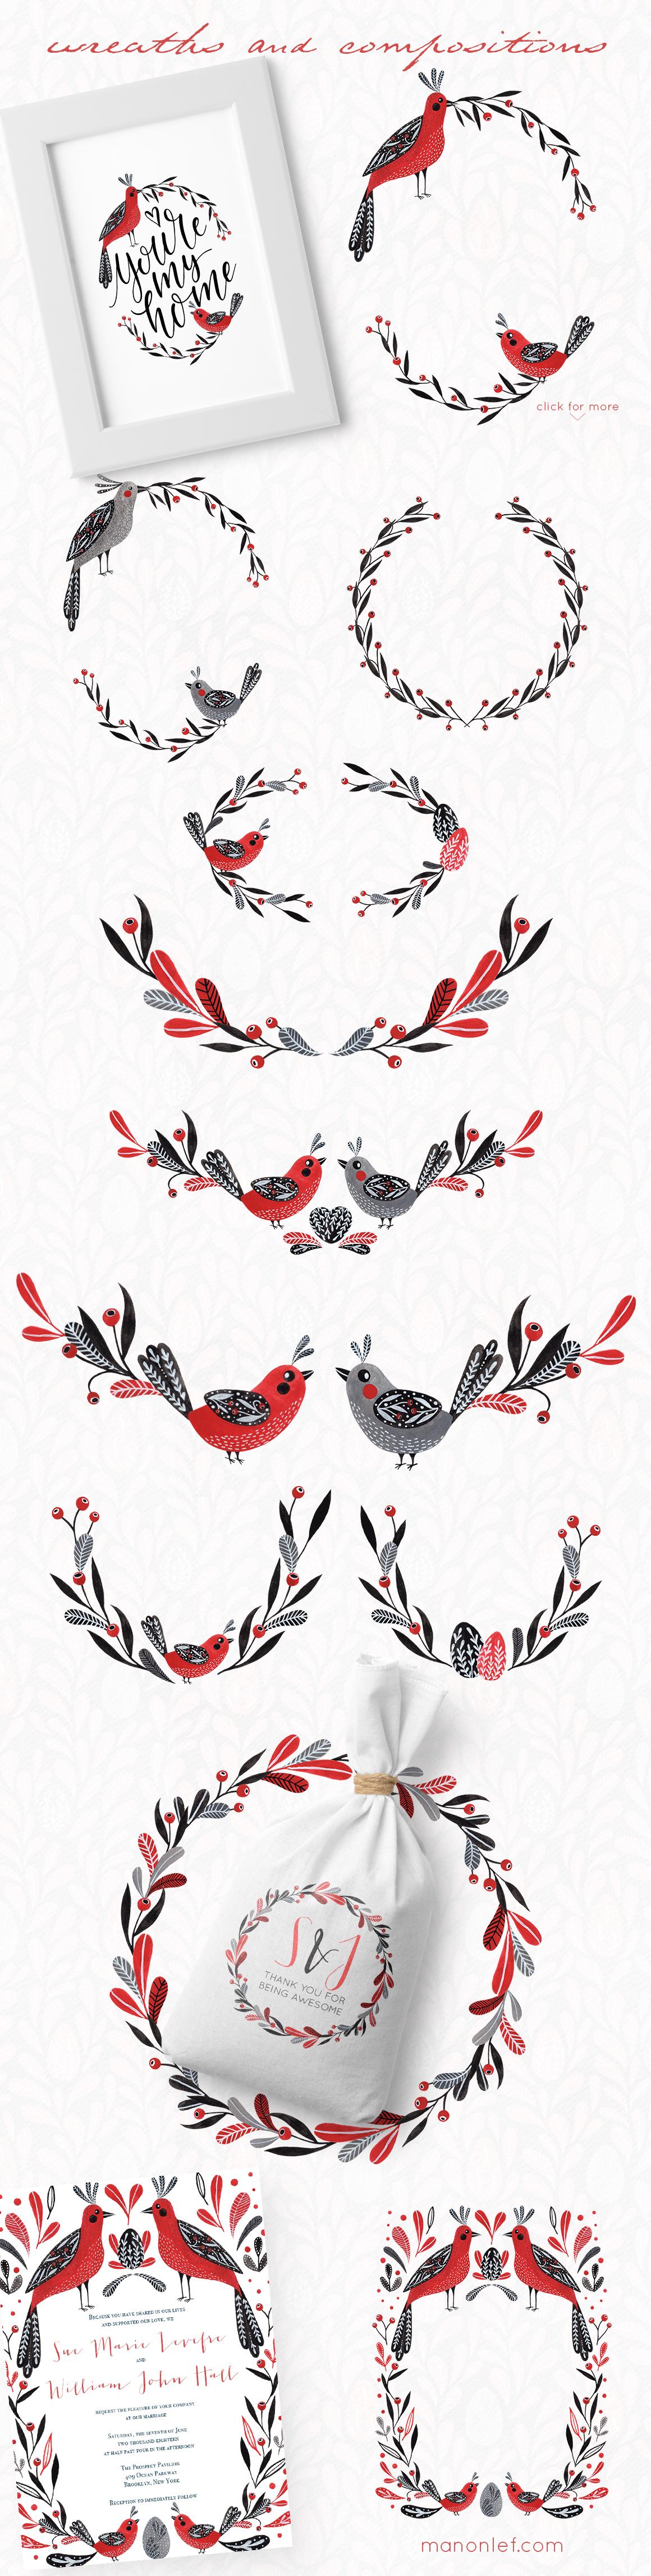 Lovebirds folk art bird illustrated collection example image 9